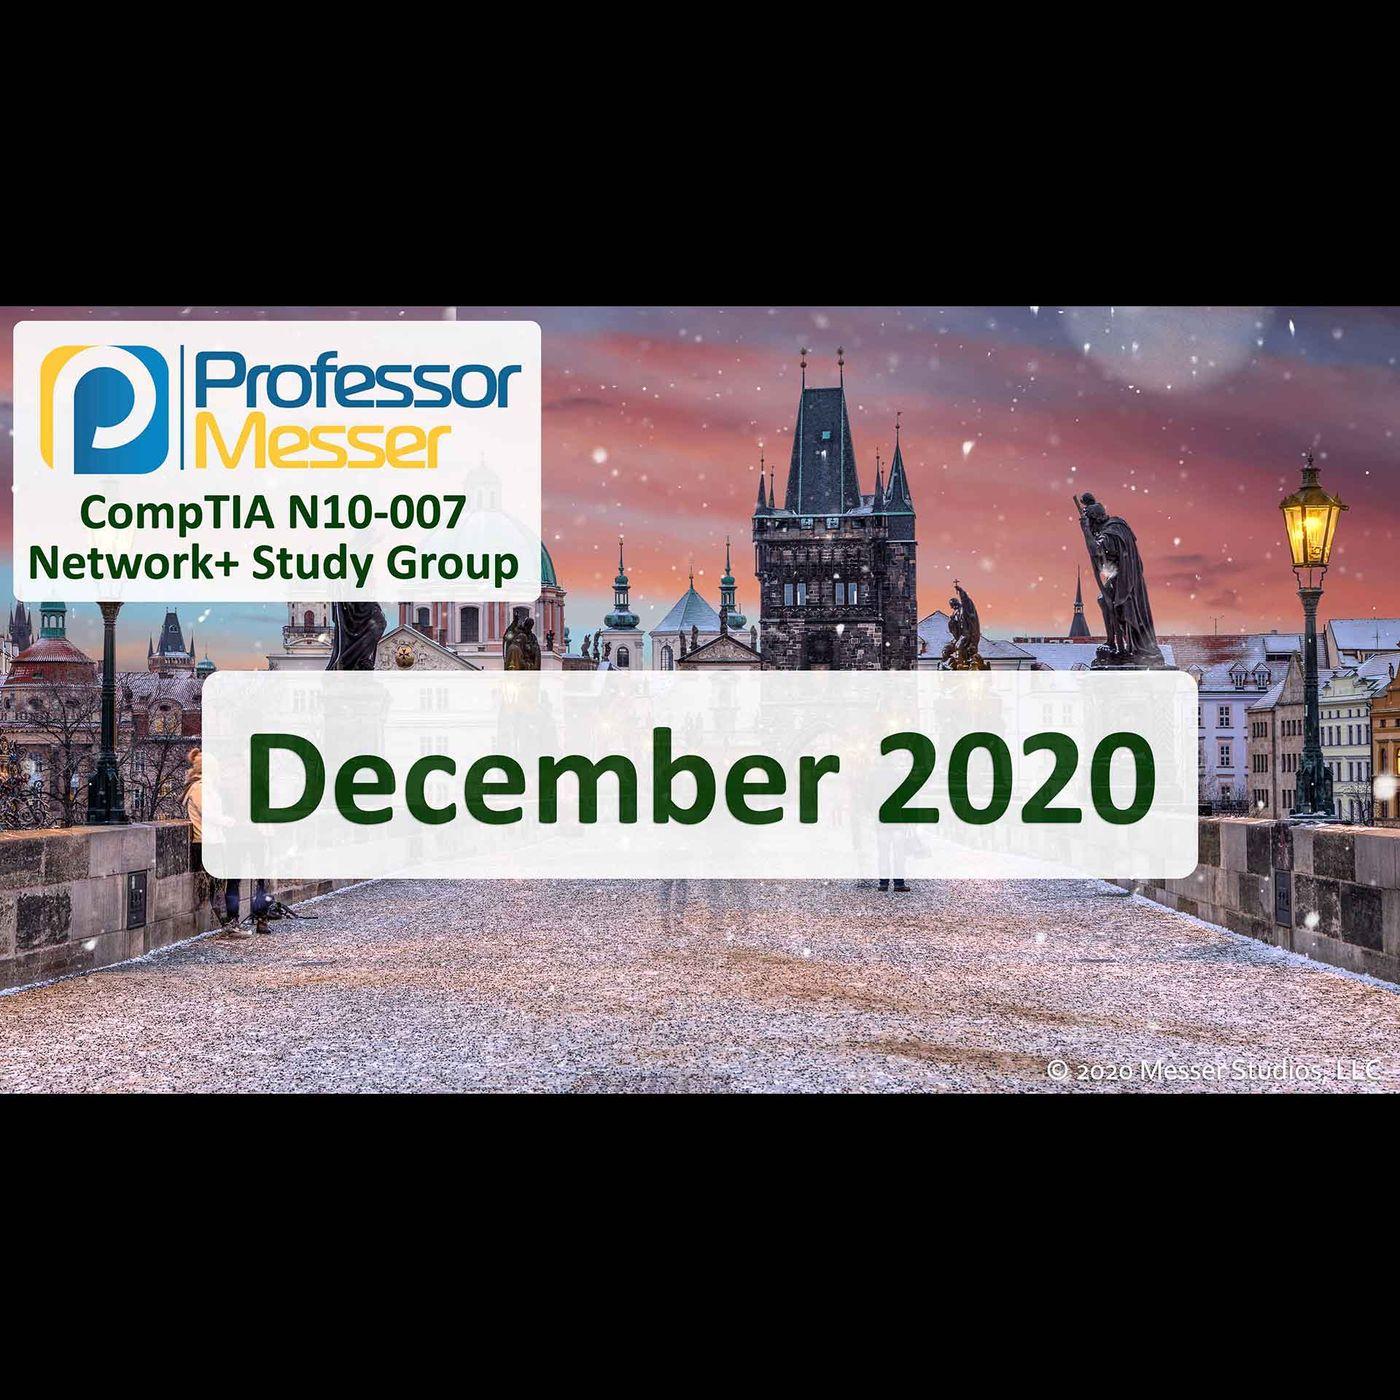 Professor Messer's Network+ Study Group After Show - December 2020